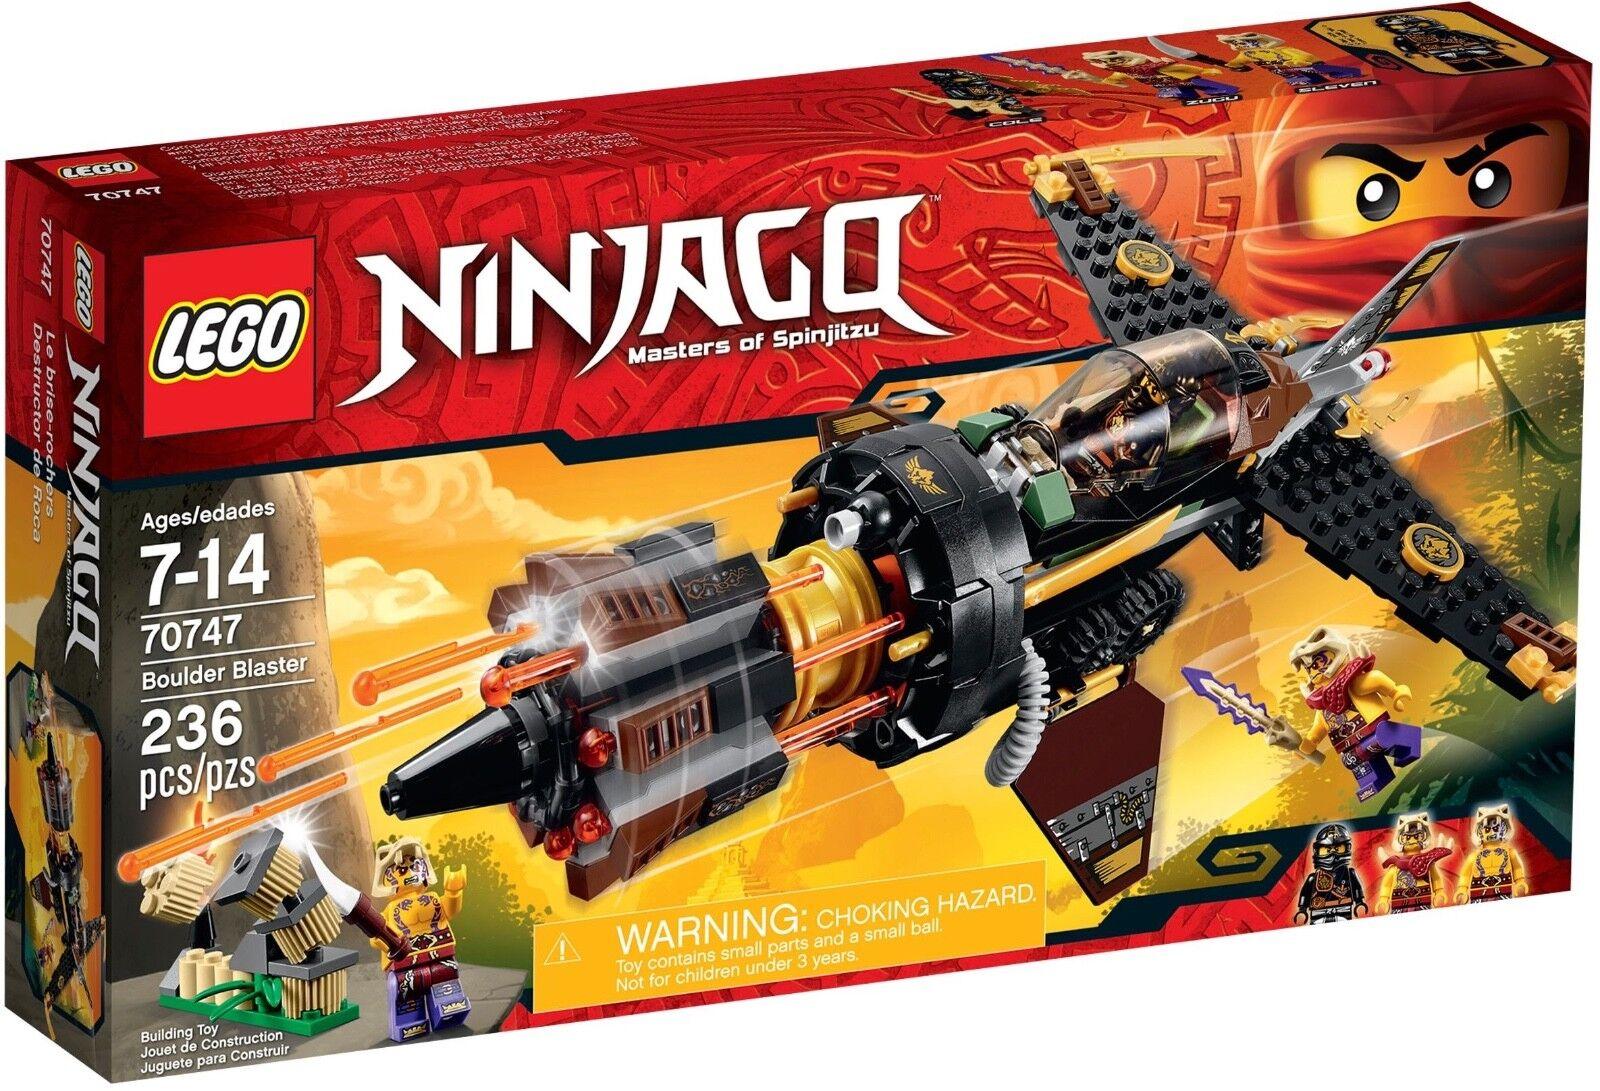 LEGO Ninjago 70747 Boulder Blaster Spinjitsu NEW Cole Minifigure minifig